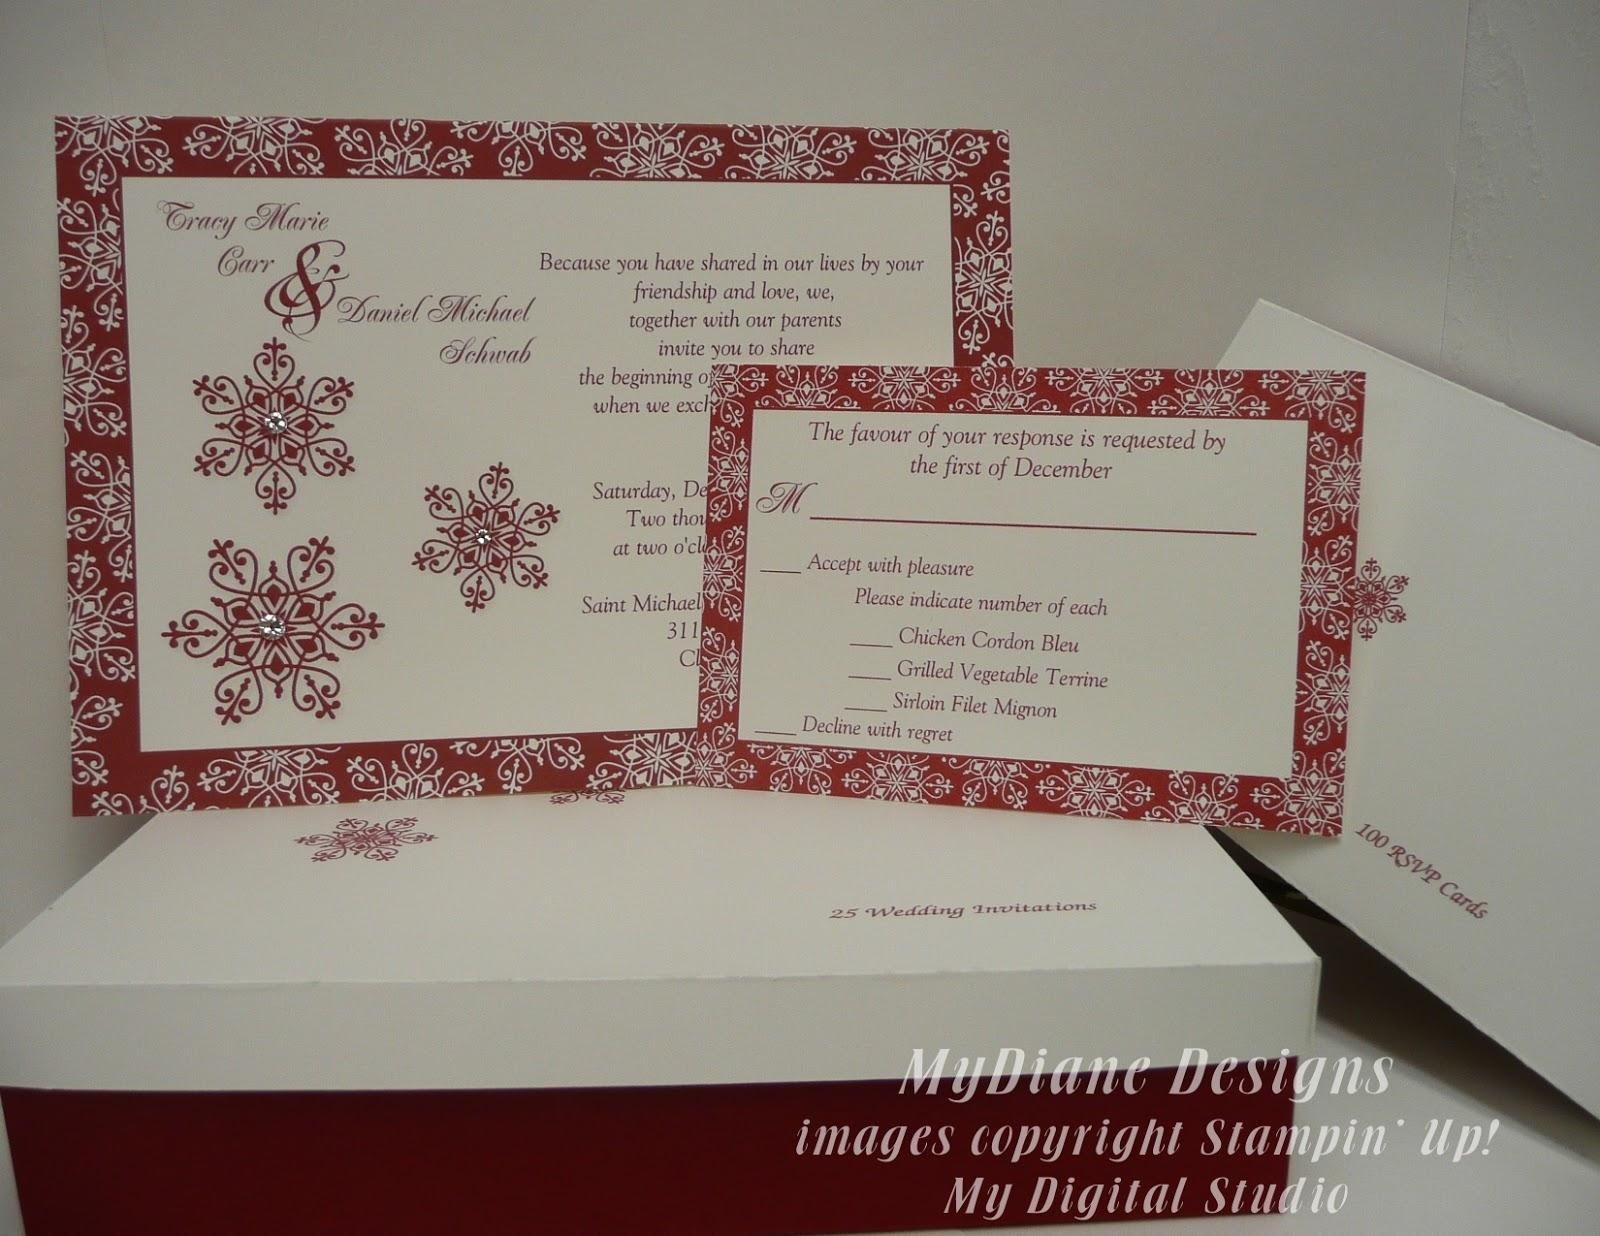 mydiane designs december wedding invitations With wedding invitations for december